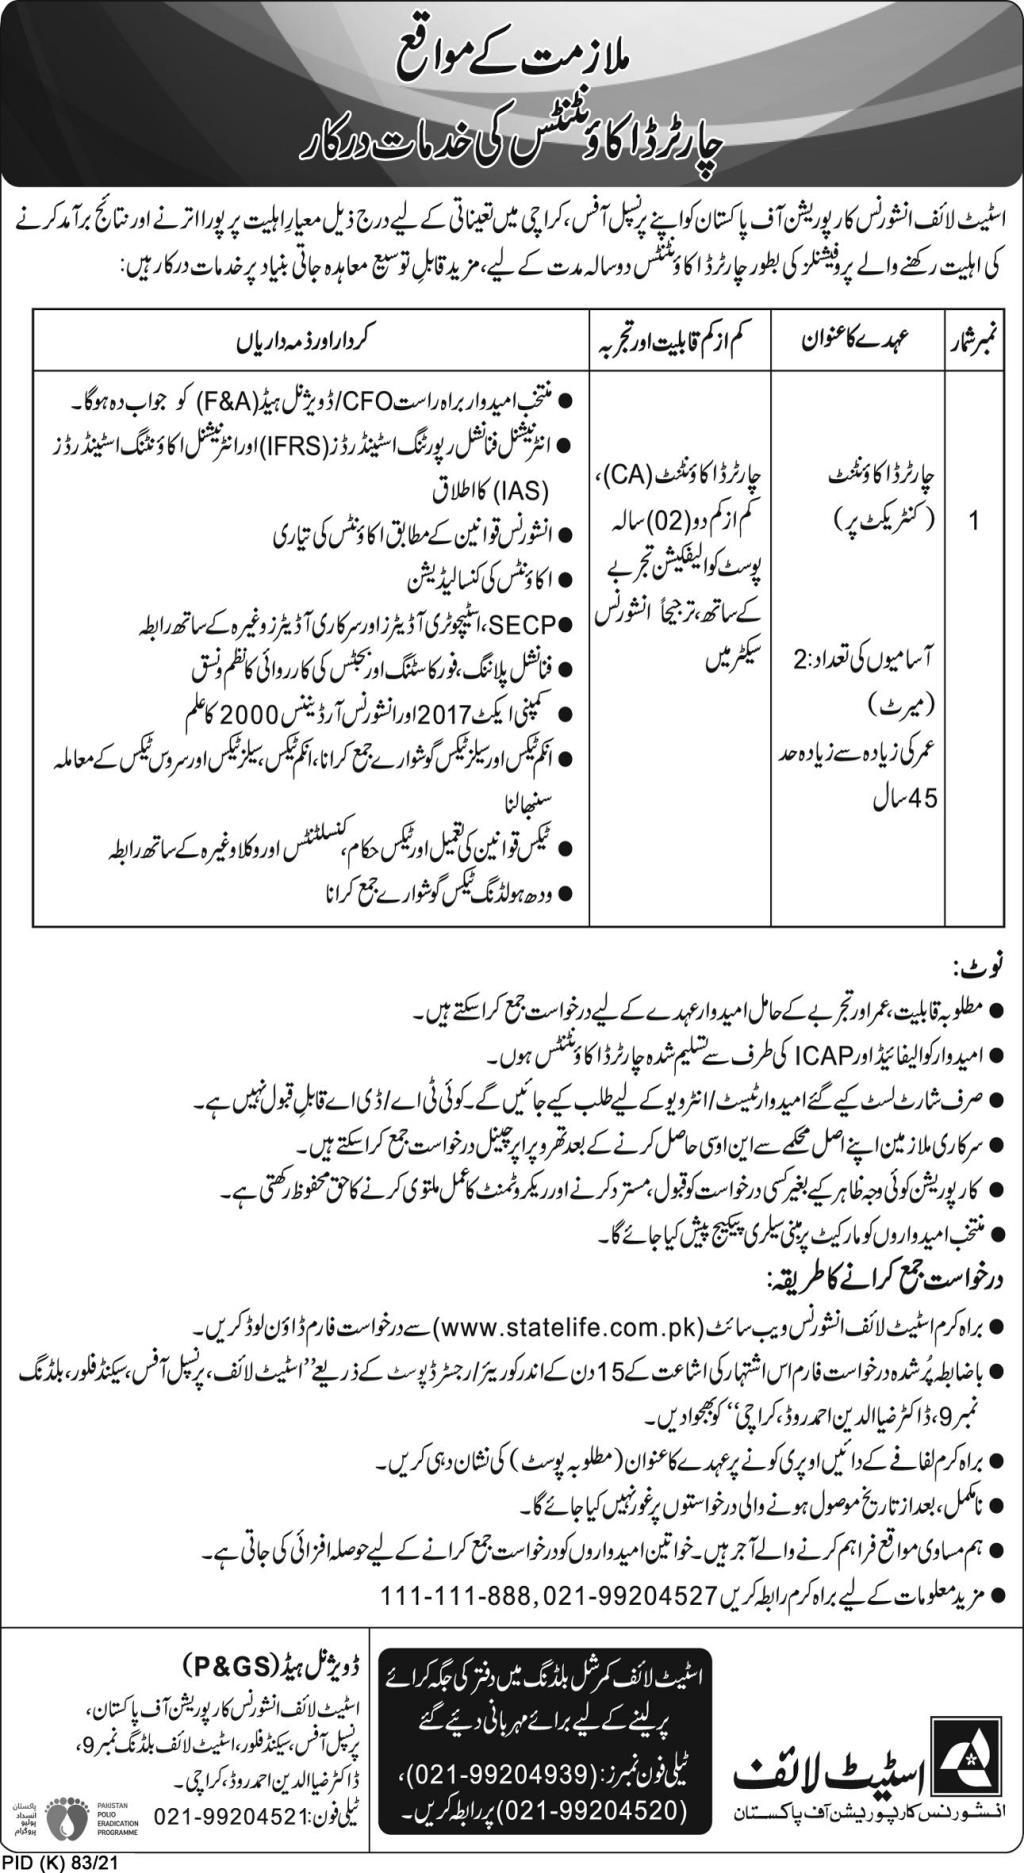 www.satelife.com.pk Jobs 2021 - State Life Insurance Corporation Pakistan Jobs 2021 in Pakistan